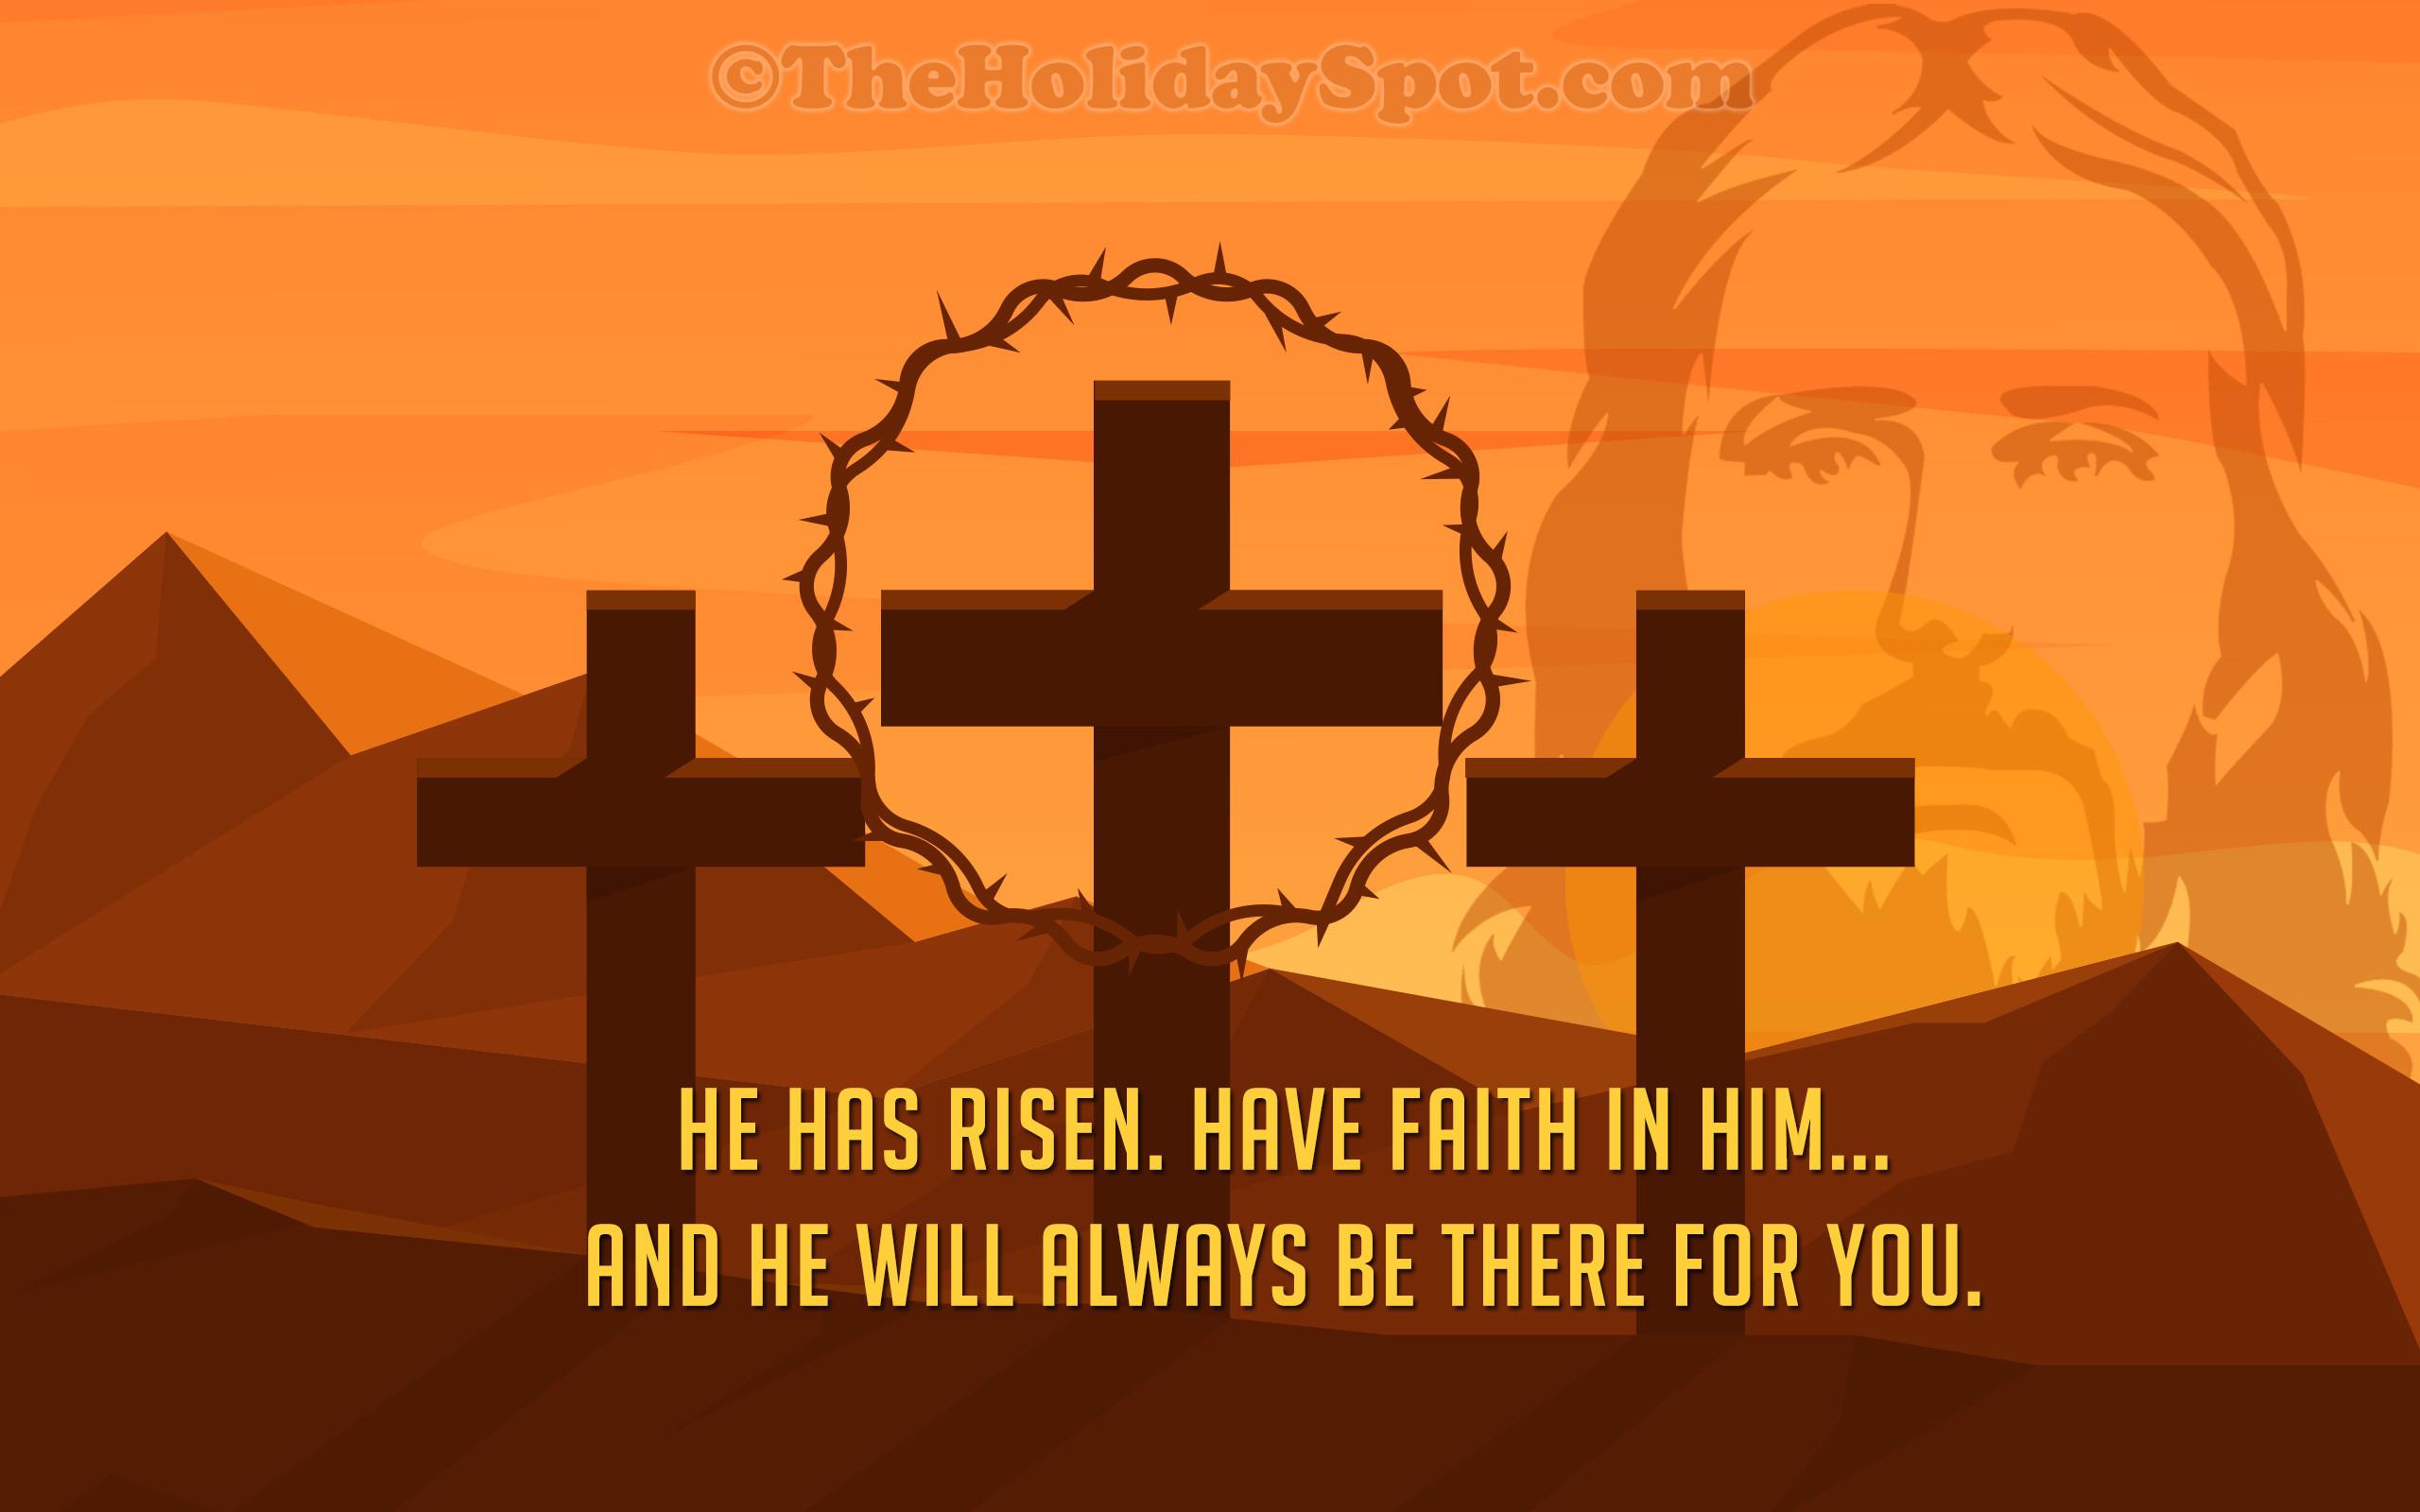 Res: 2560x1600, Easter Wallpaper - He has risen